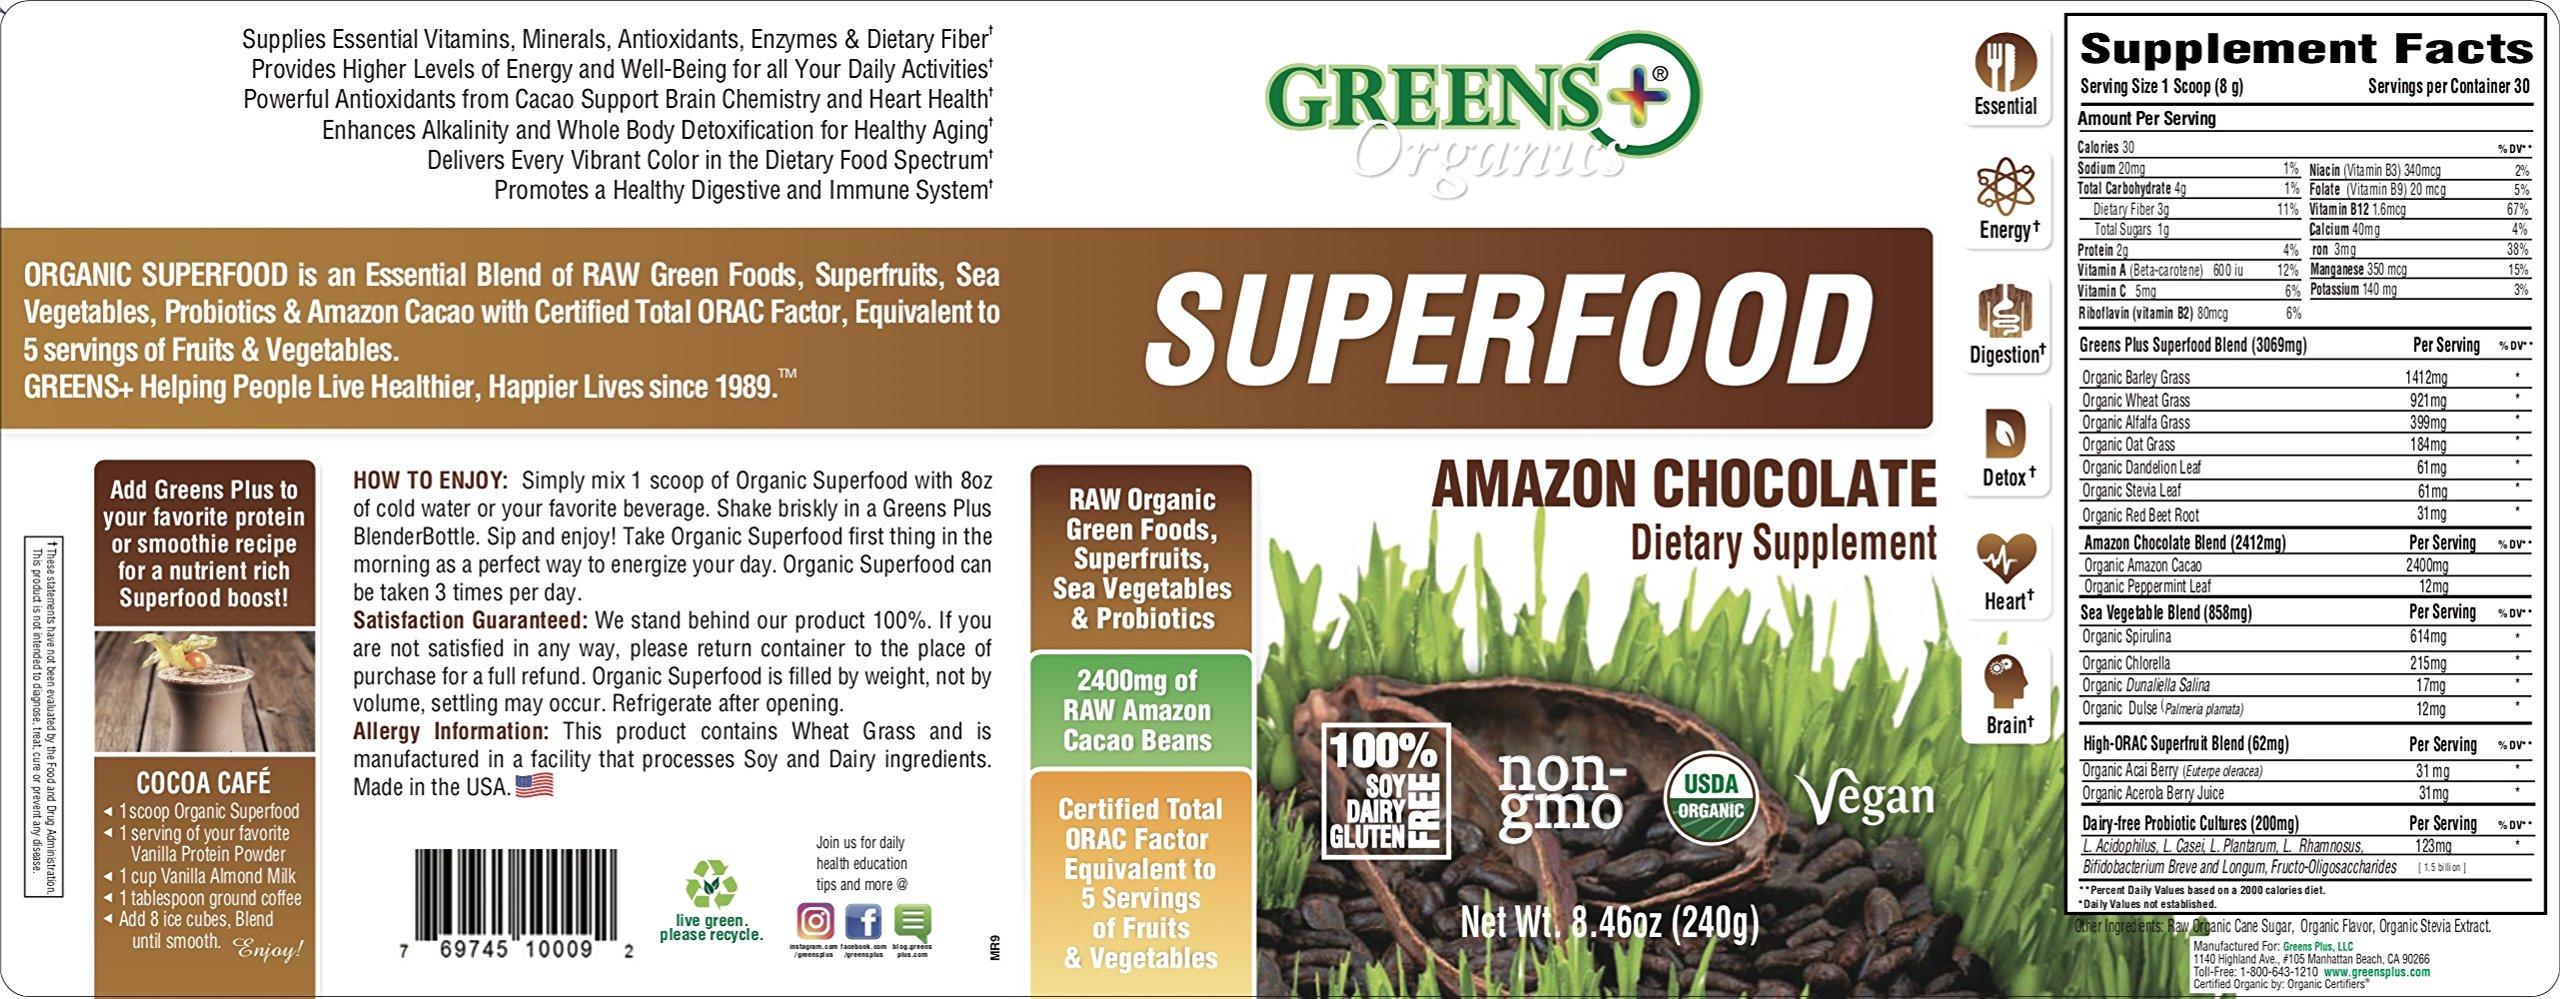 Greens Plus Organics Super-Food Amazon Chocolate | Non GMO | Dietary Supplement Greens Powder - 8.46 Oz